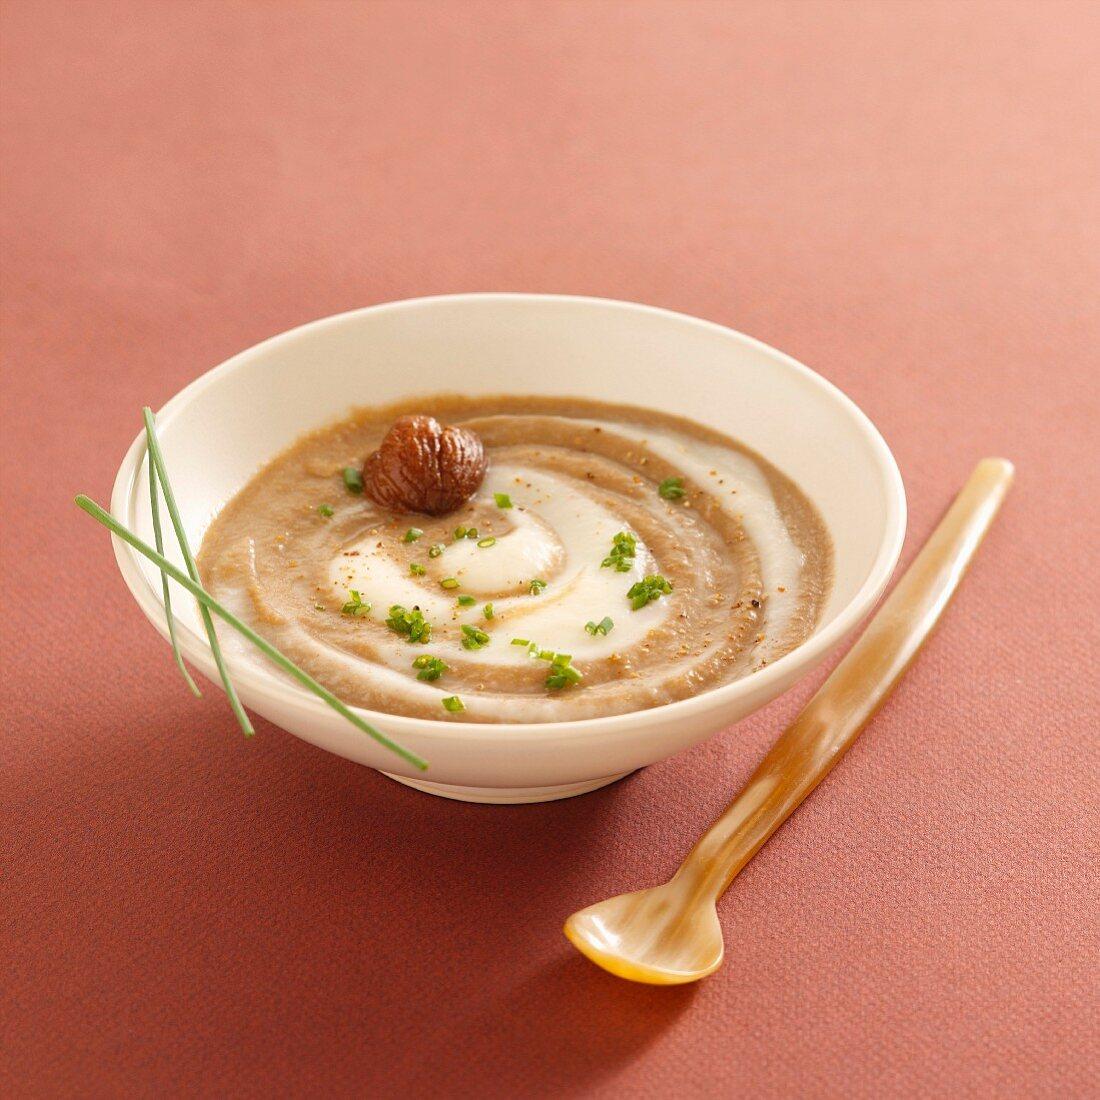 Cream of Jerusalem artichoke and chestnut soup